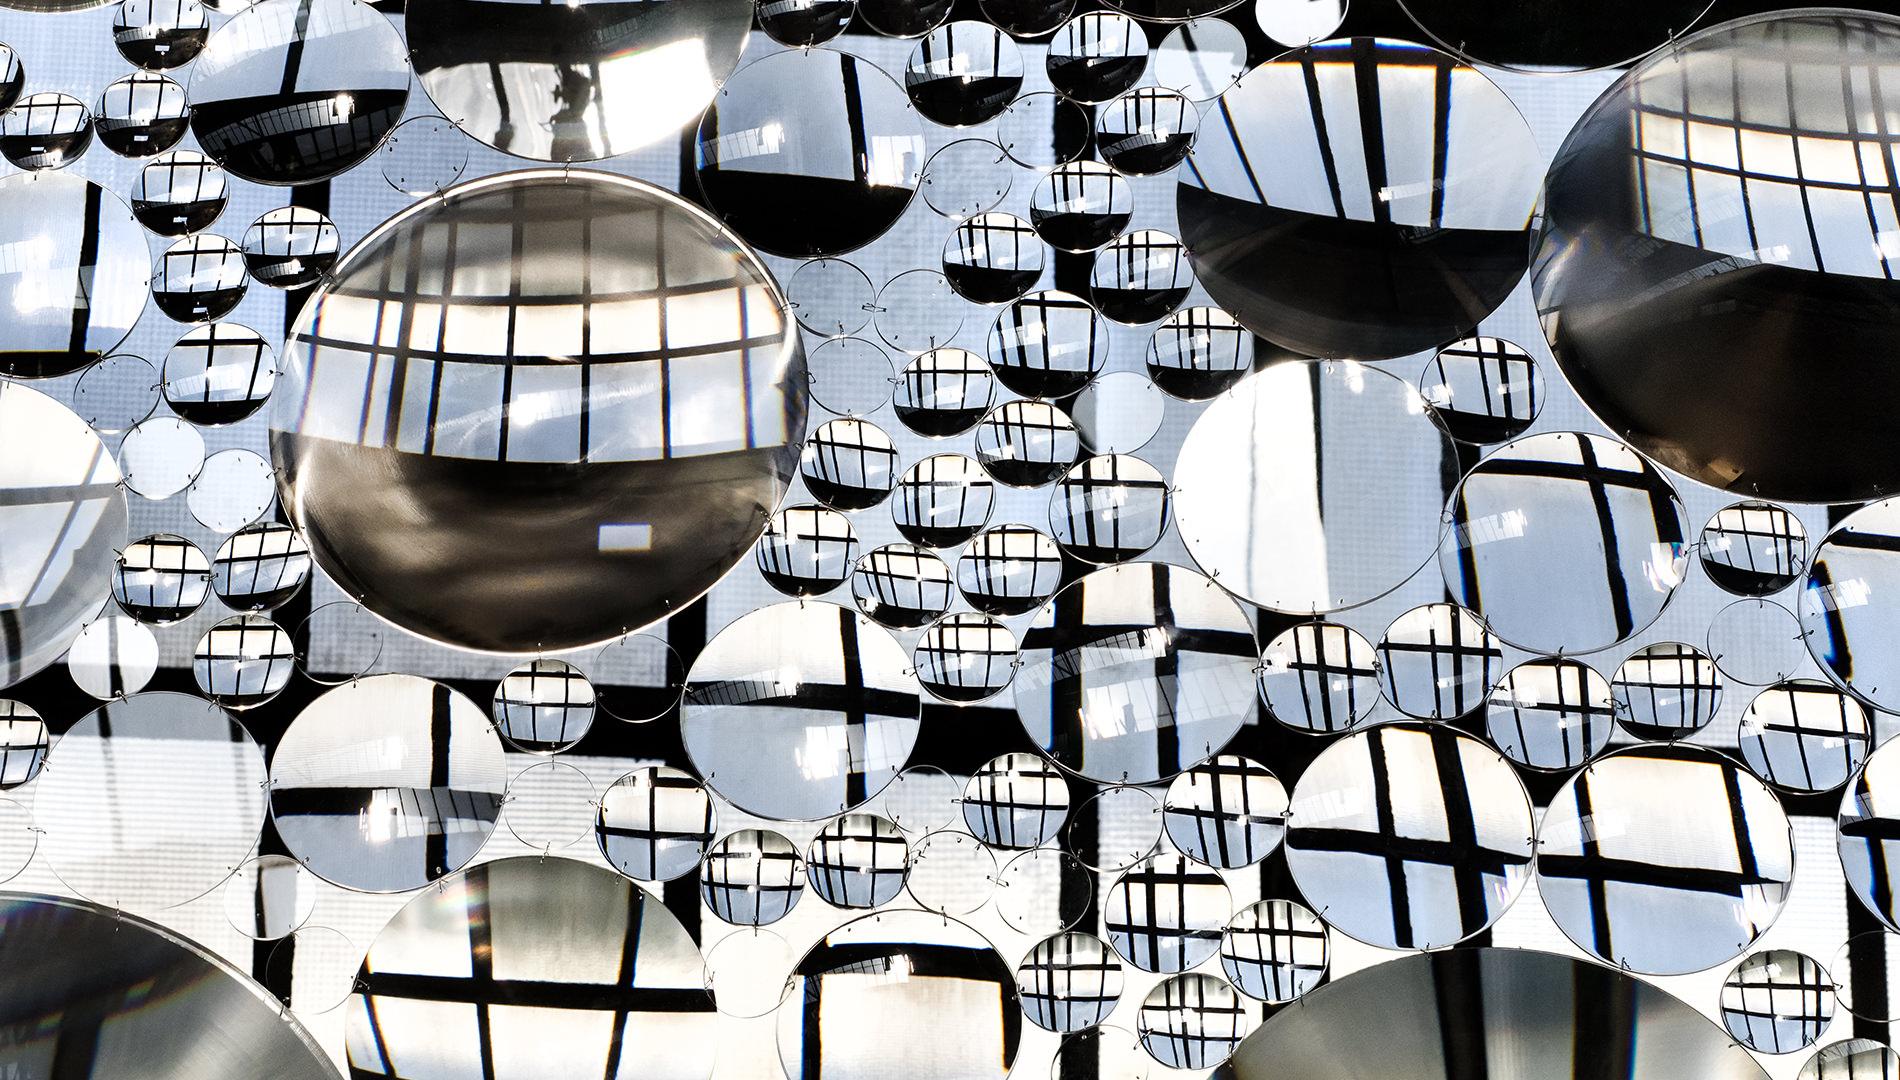 Messe Design Live Kommunikation Köln Mülheim Carlswerk Olympus Perspective Playground Acryl-Linsen Going Places EventLabs